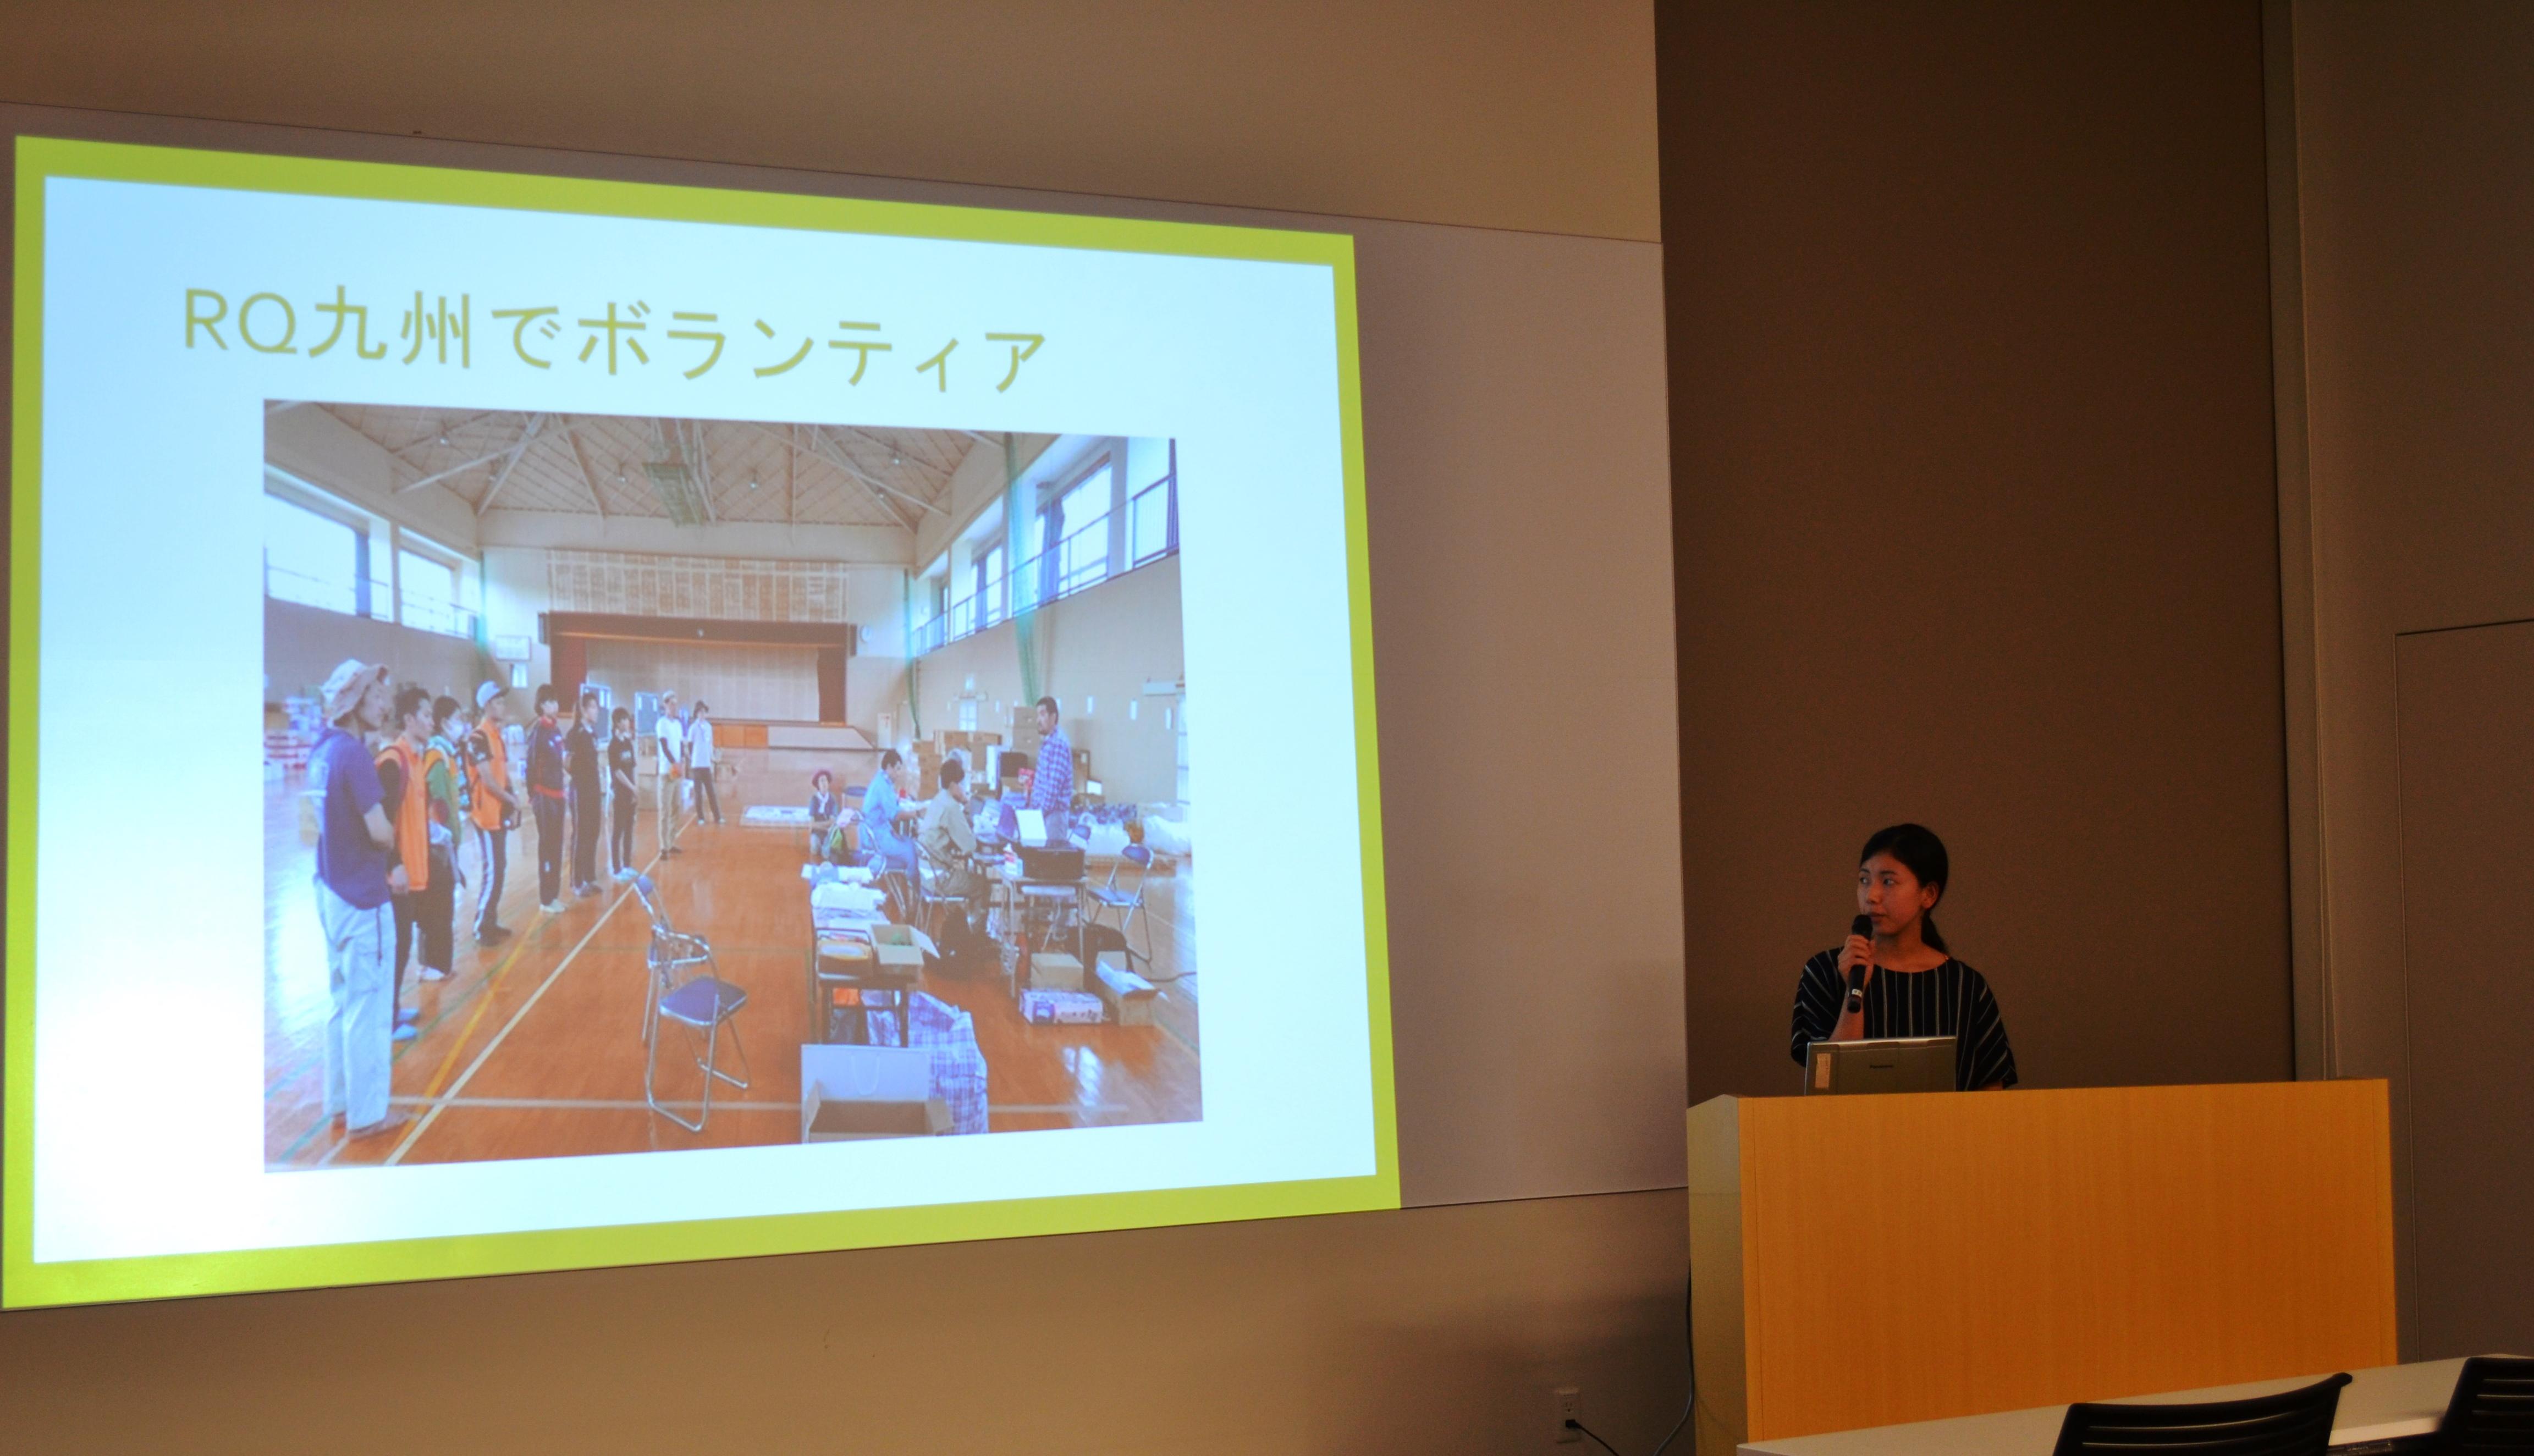 http://www.kagoshima-u.ac.jp/volunt/main/DSC_0312.JPG